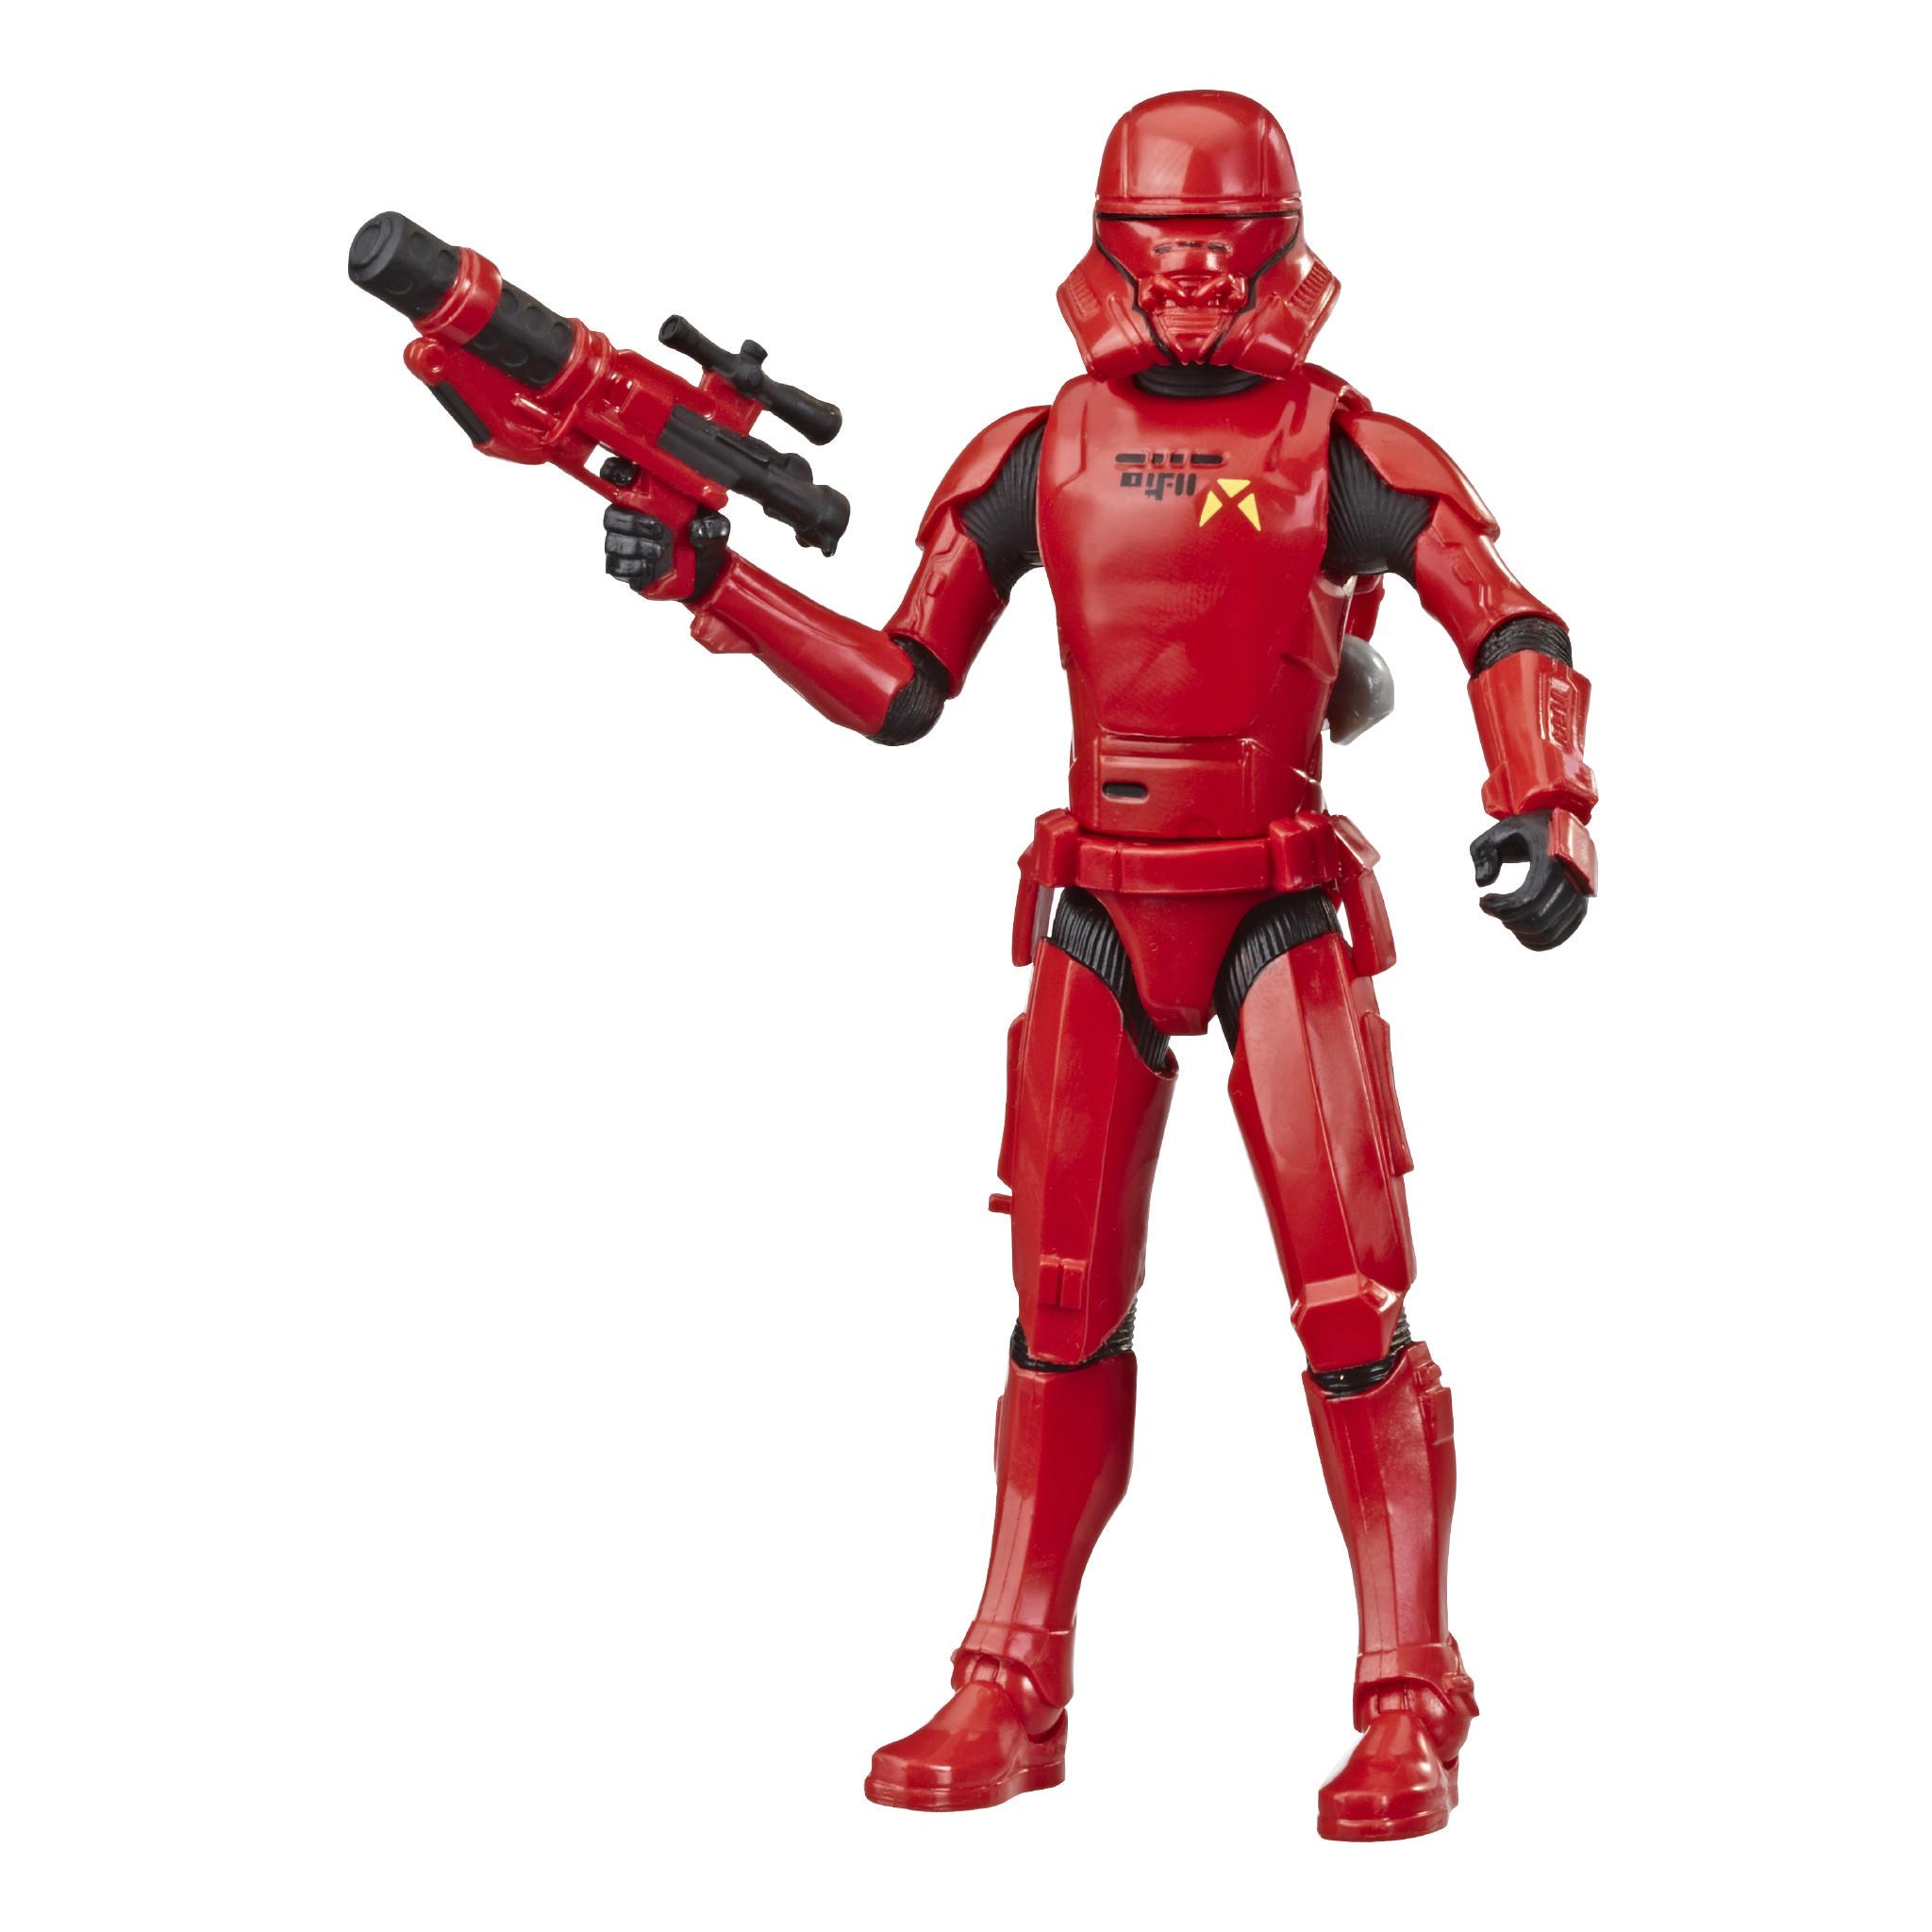 SWGOA (TROS) First Order Sith Jet Trooper Figure 2